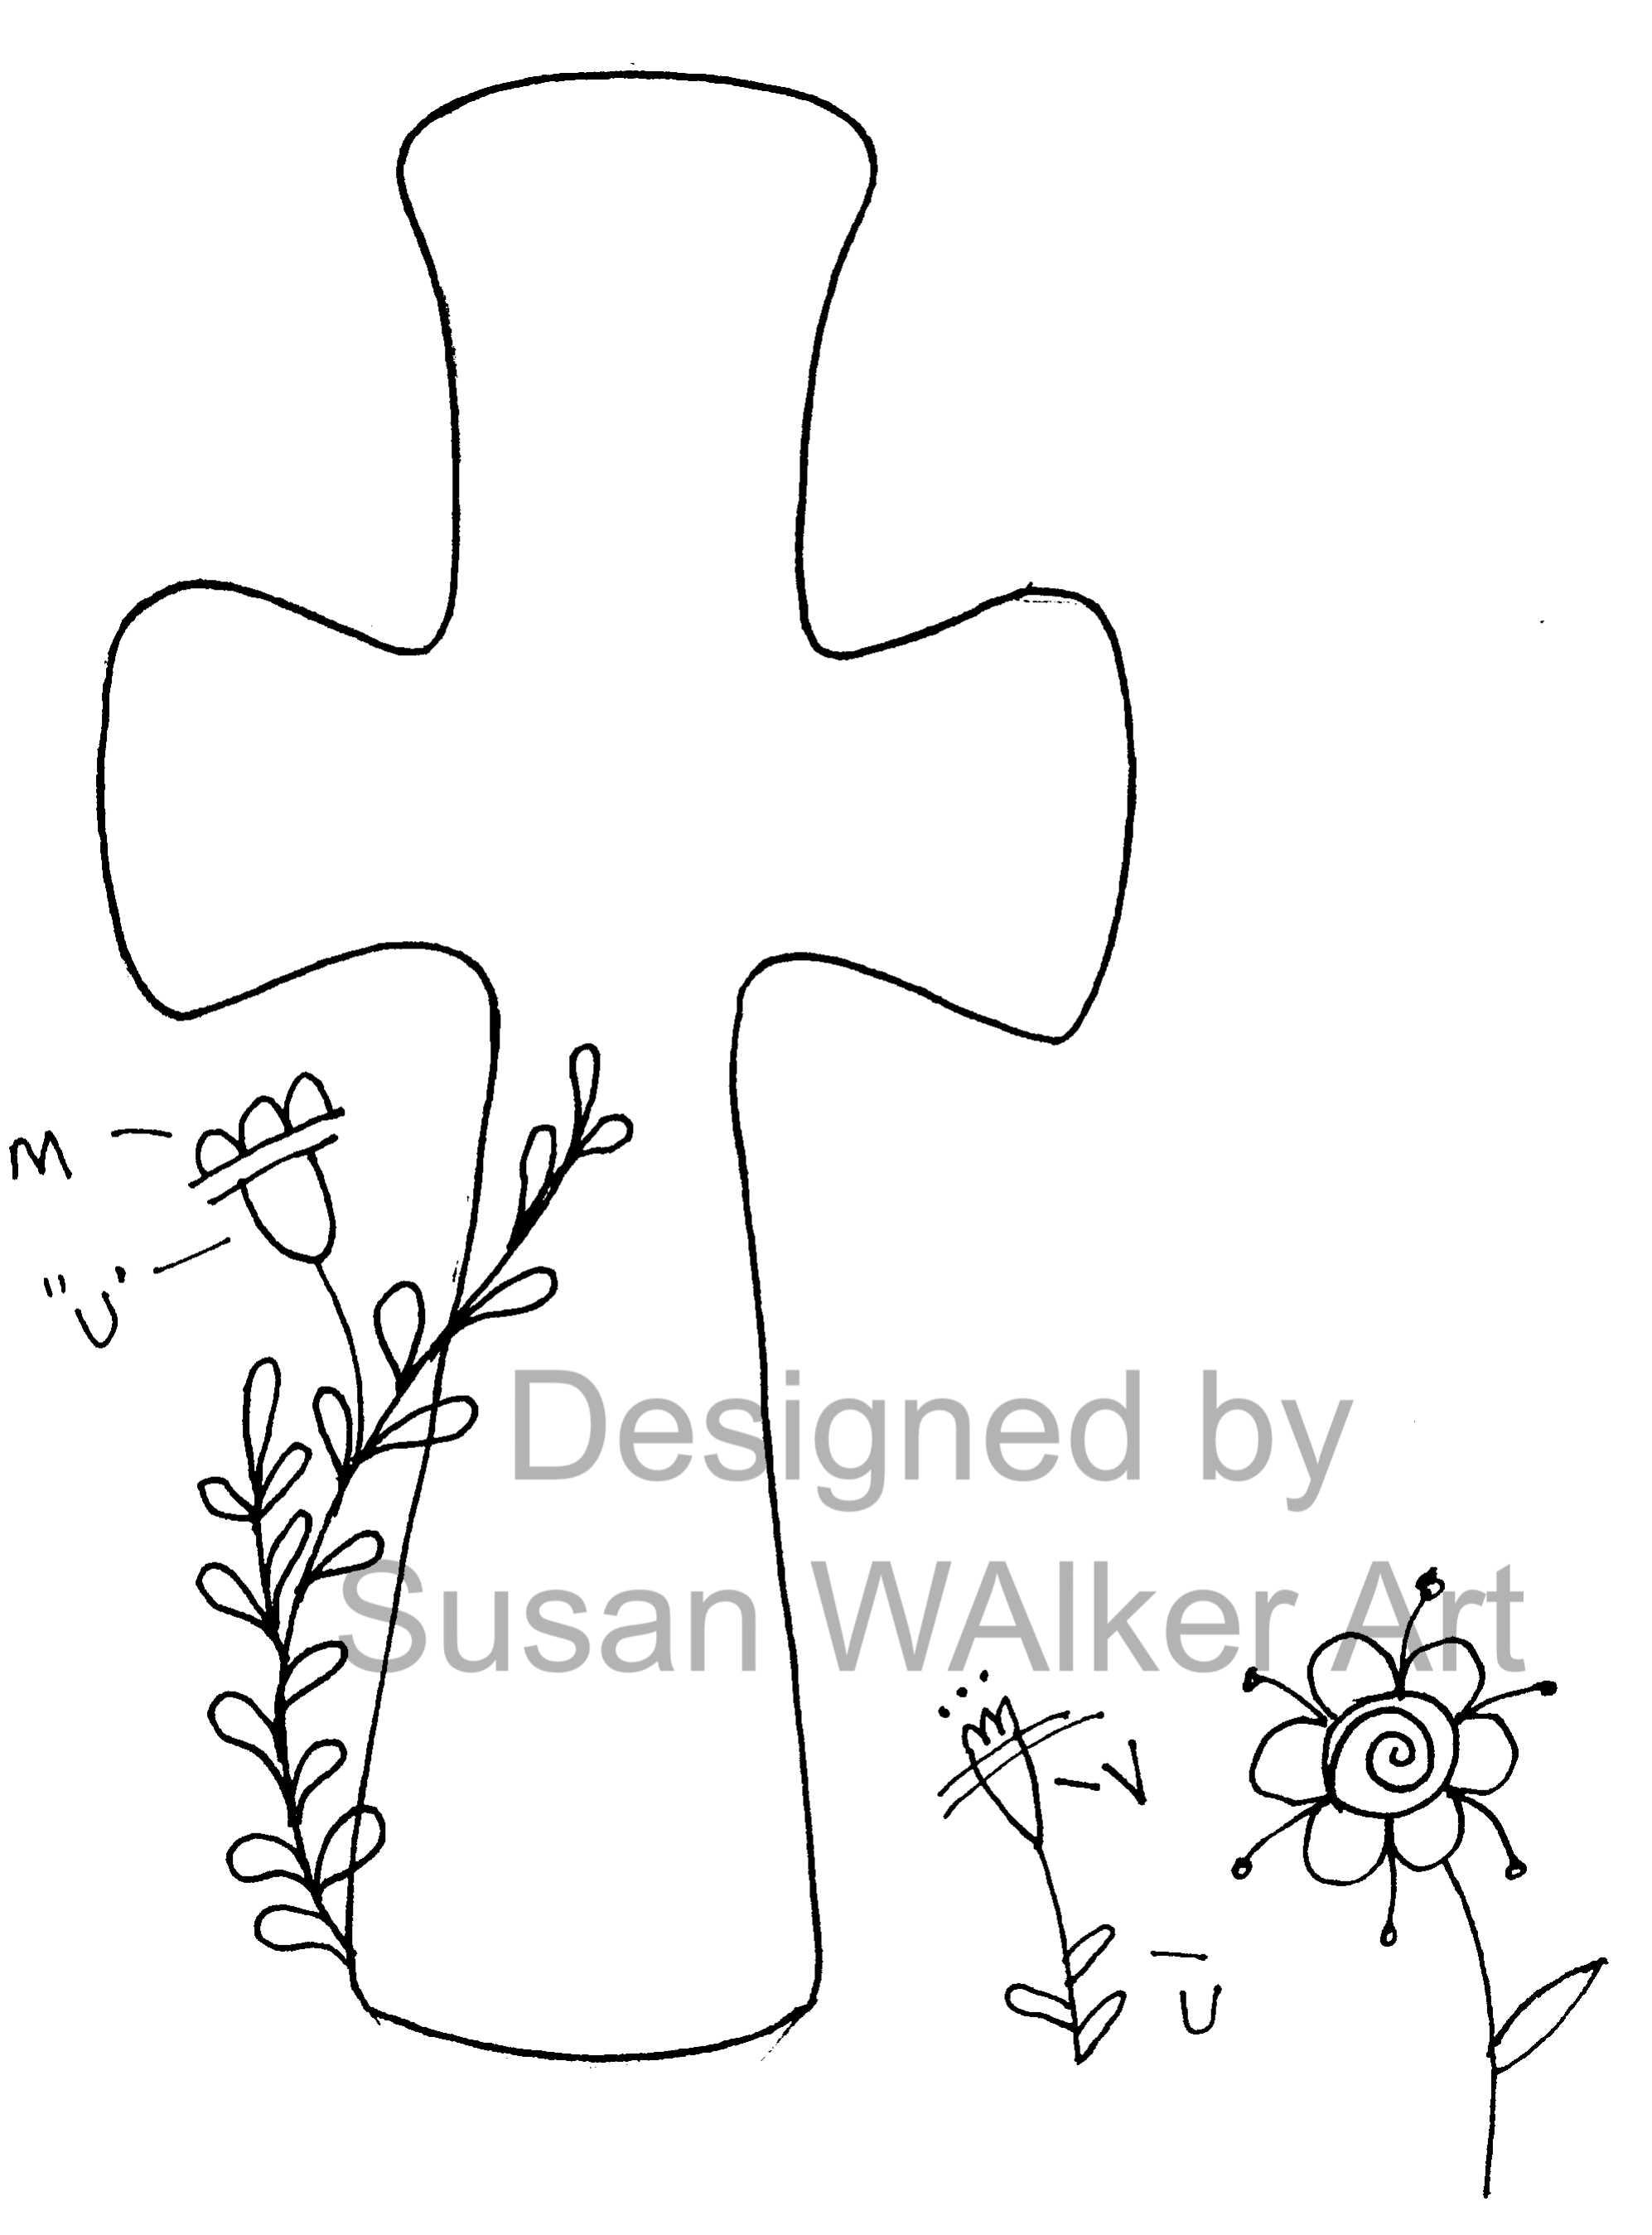 photo regarding Cross Template Printable named Floral,Rounded Cross Bible Artwork Journaling Template Printable (Replica)